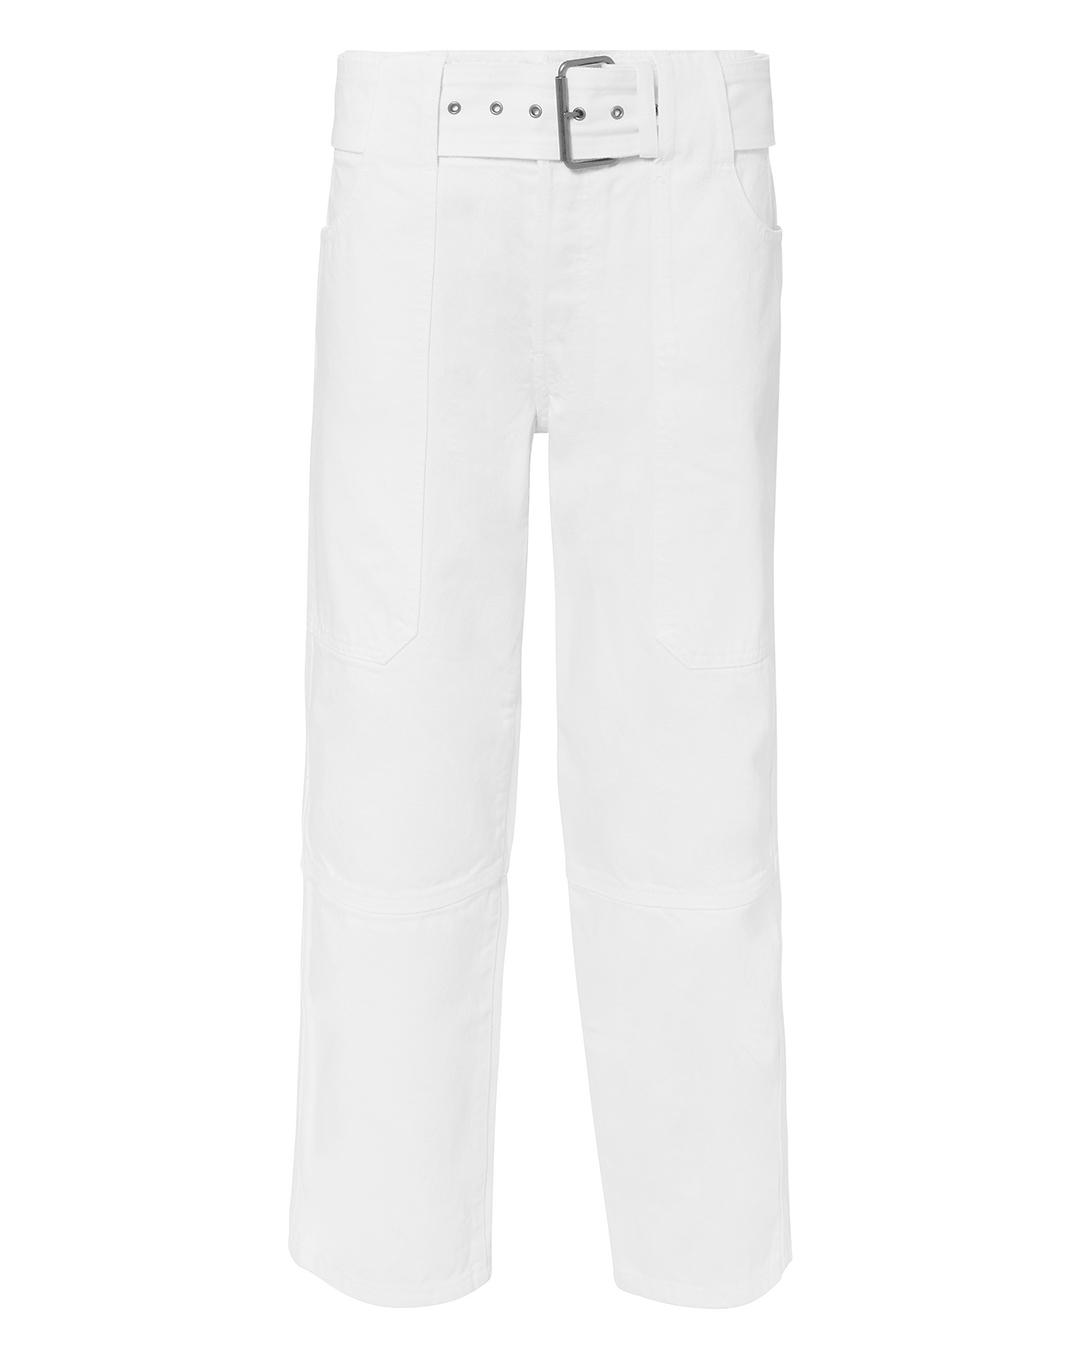 PSWL PROENZA SCHOULER  UTILITY WHITE JEANS WHITE